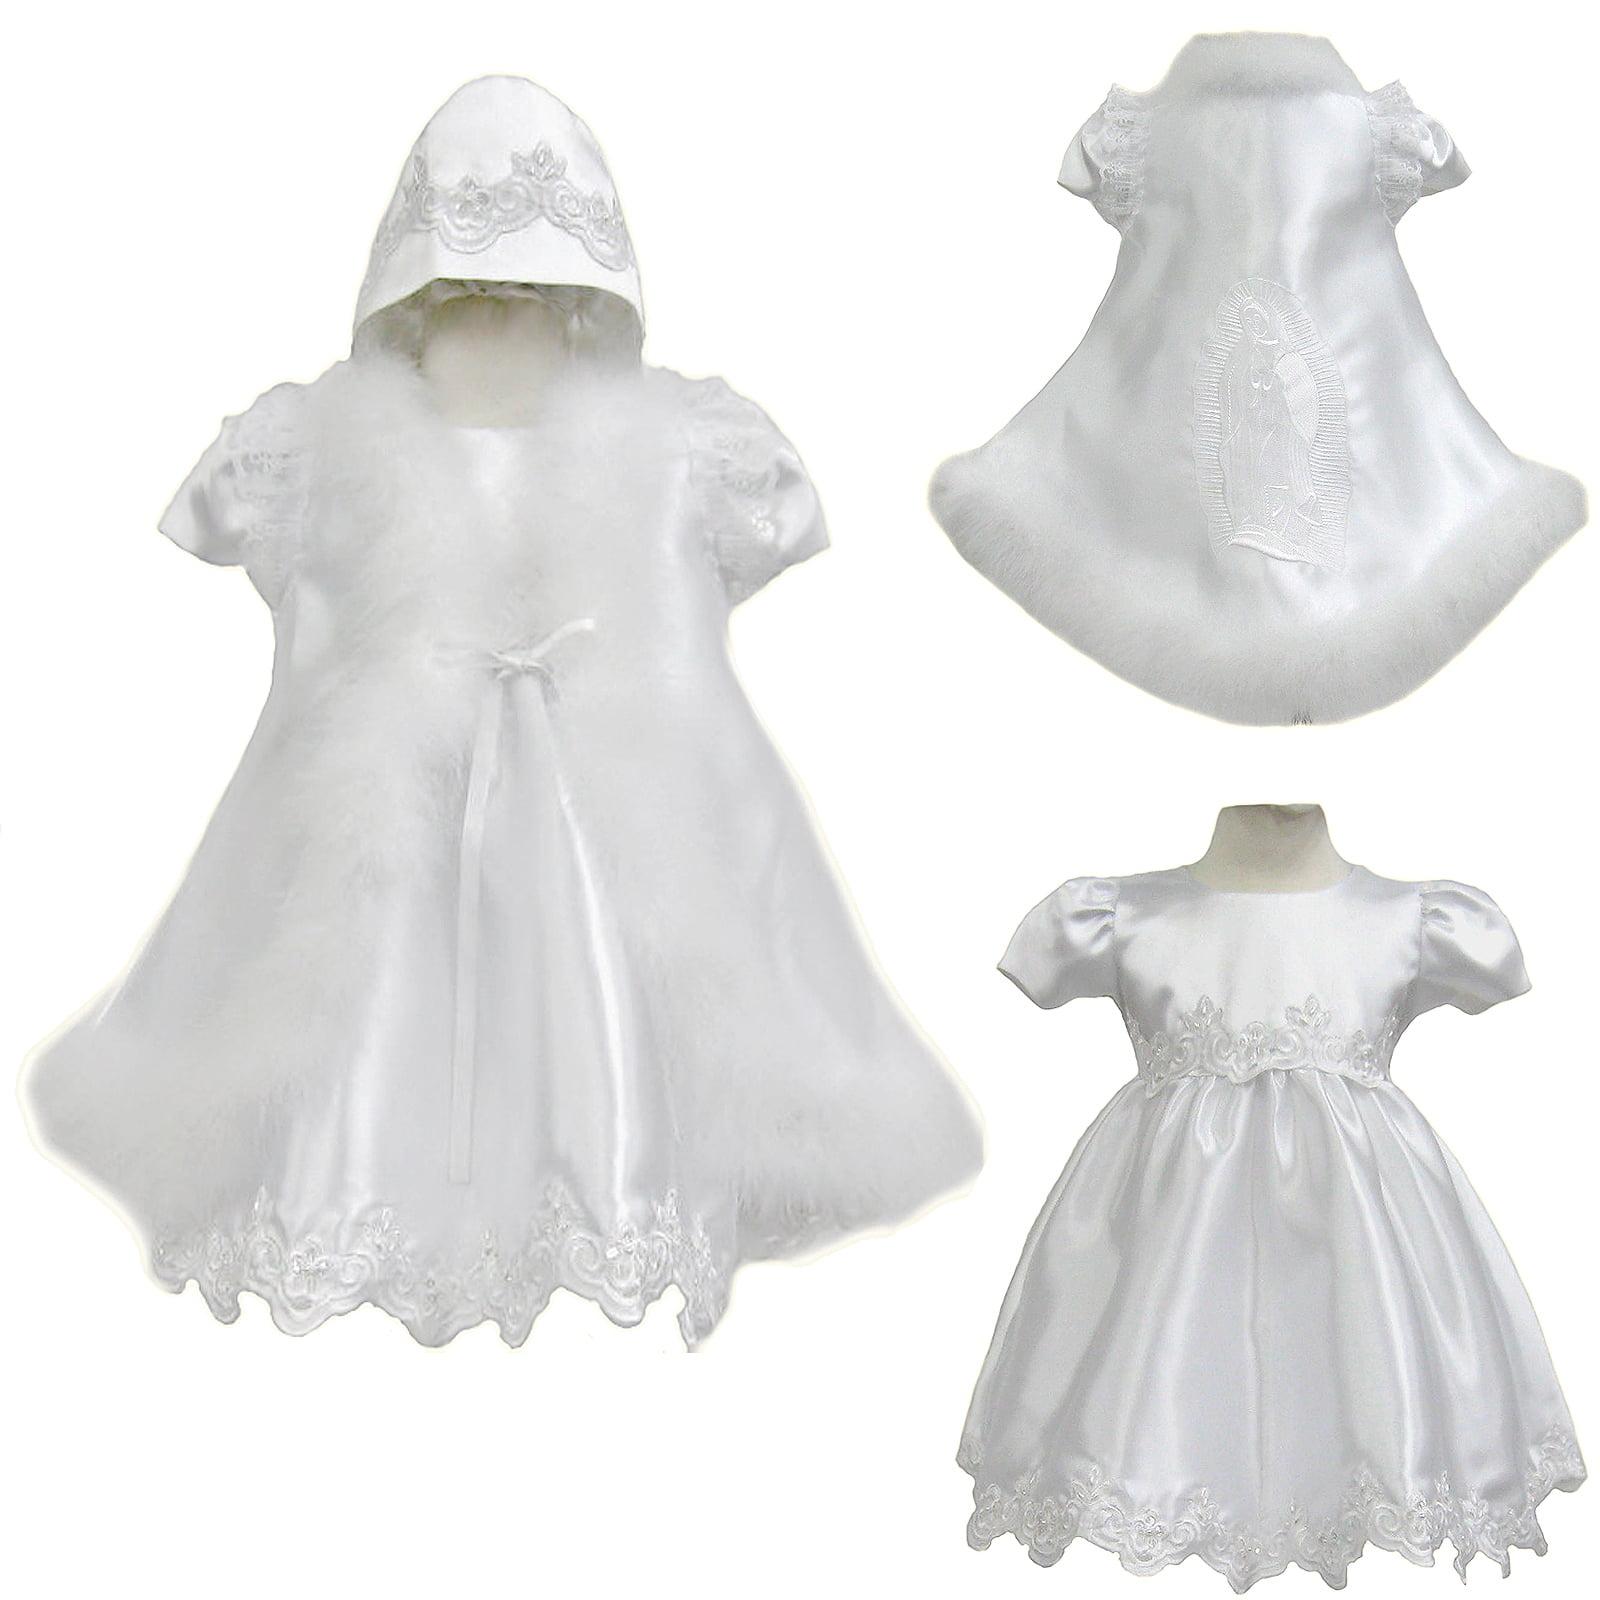 Girl Baby Infant Toddler Girl Christening Baptism Formal Gown Dress 0-30 months